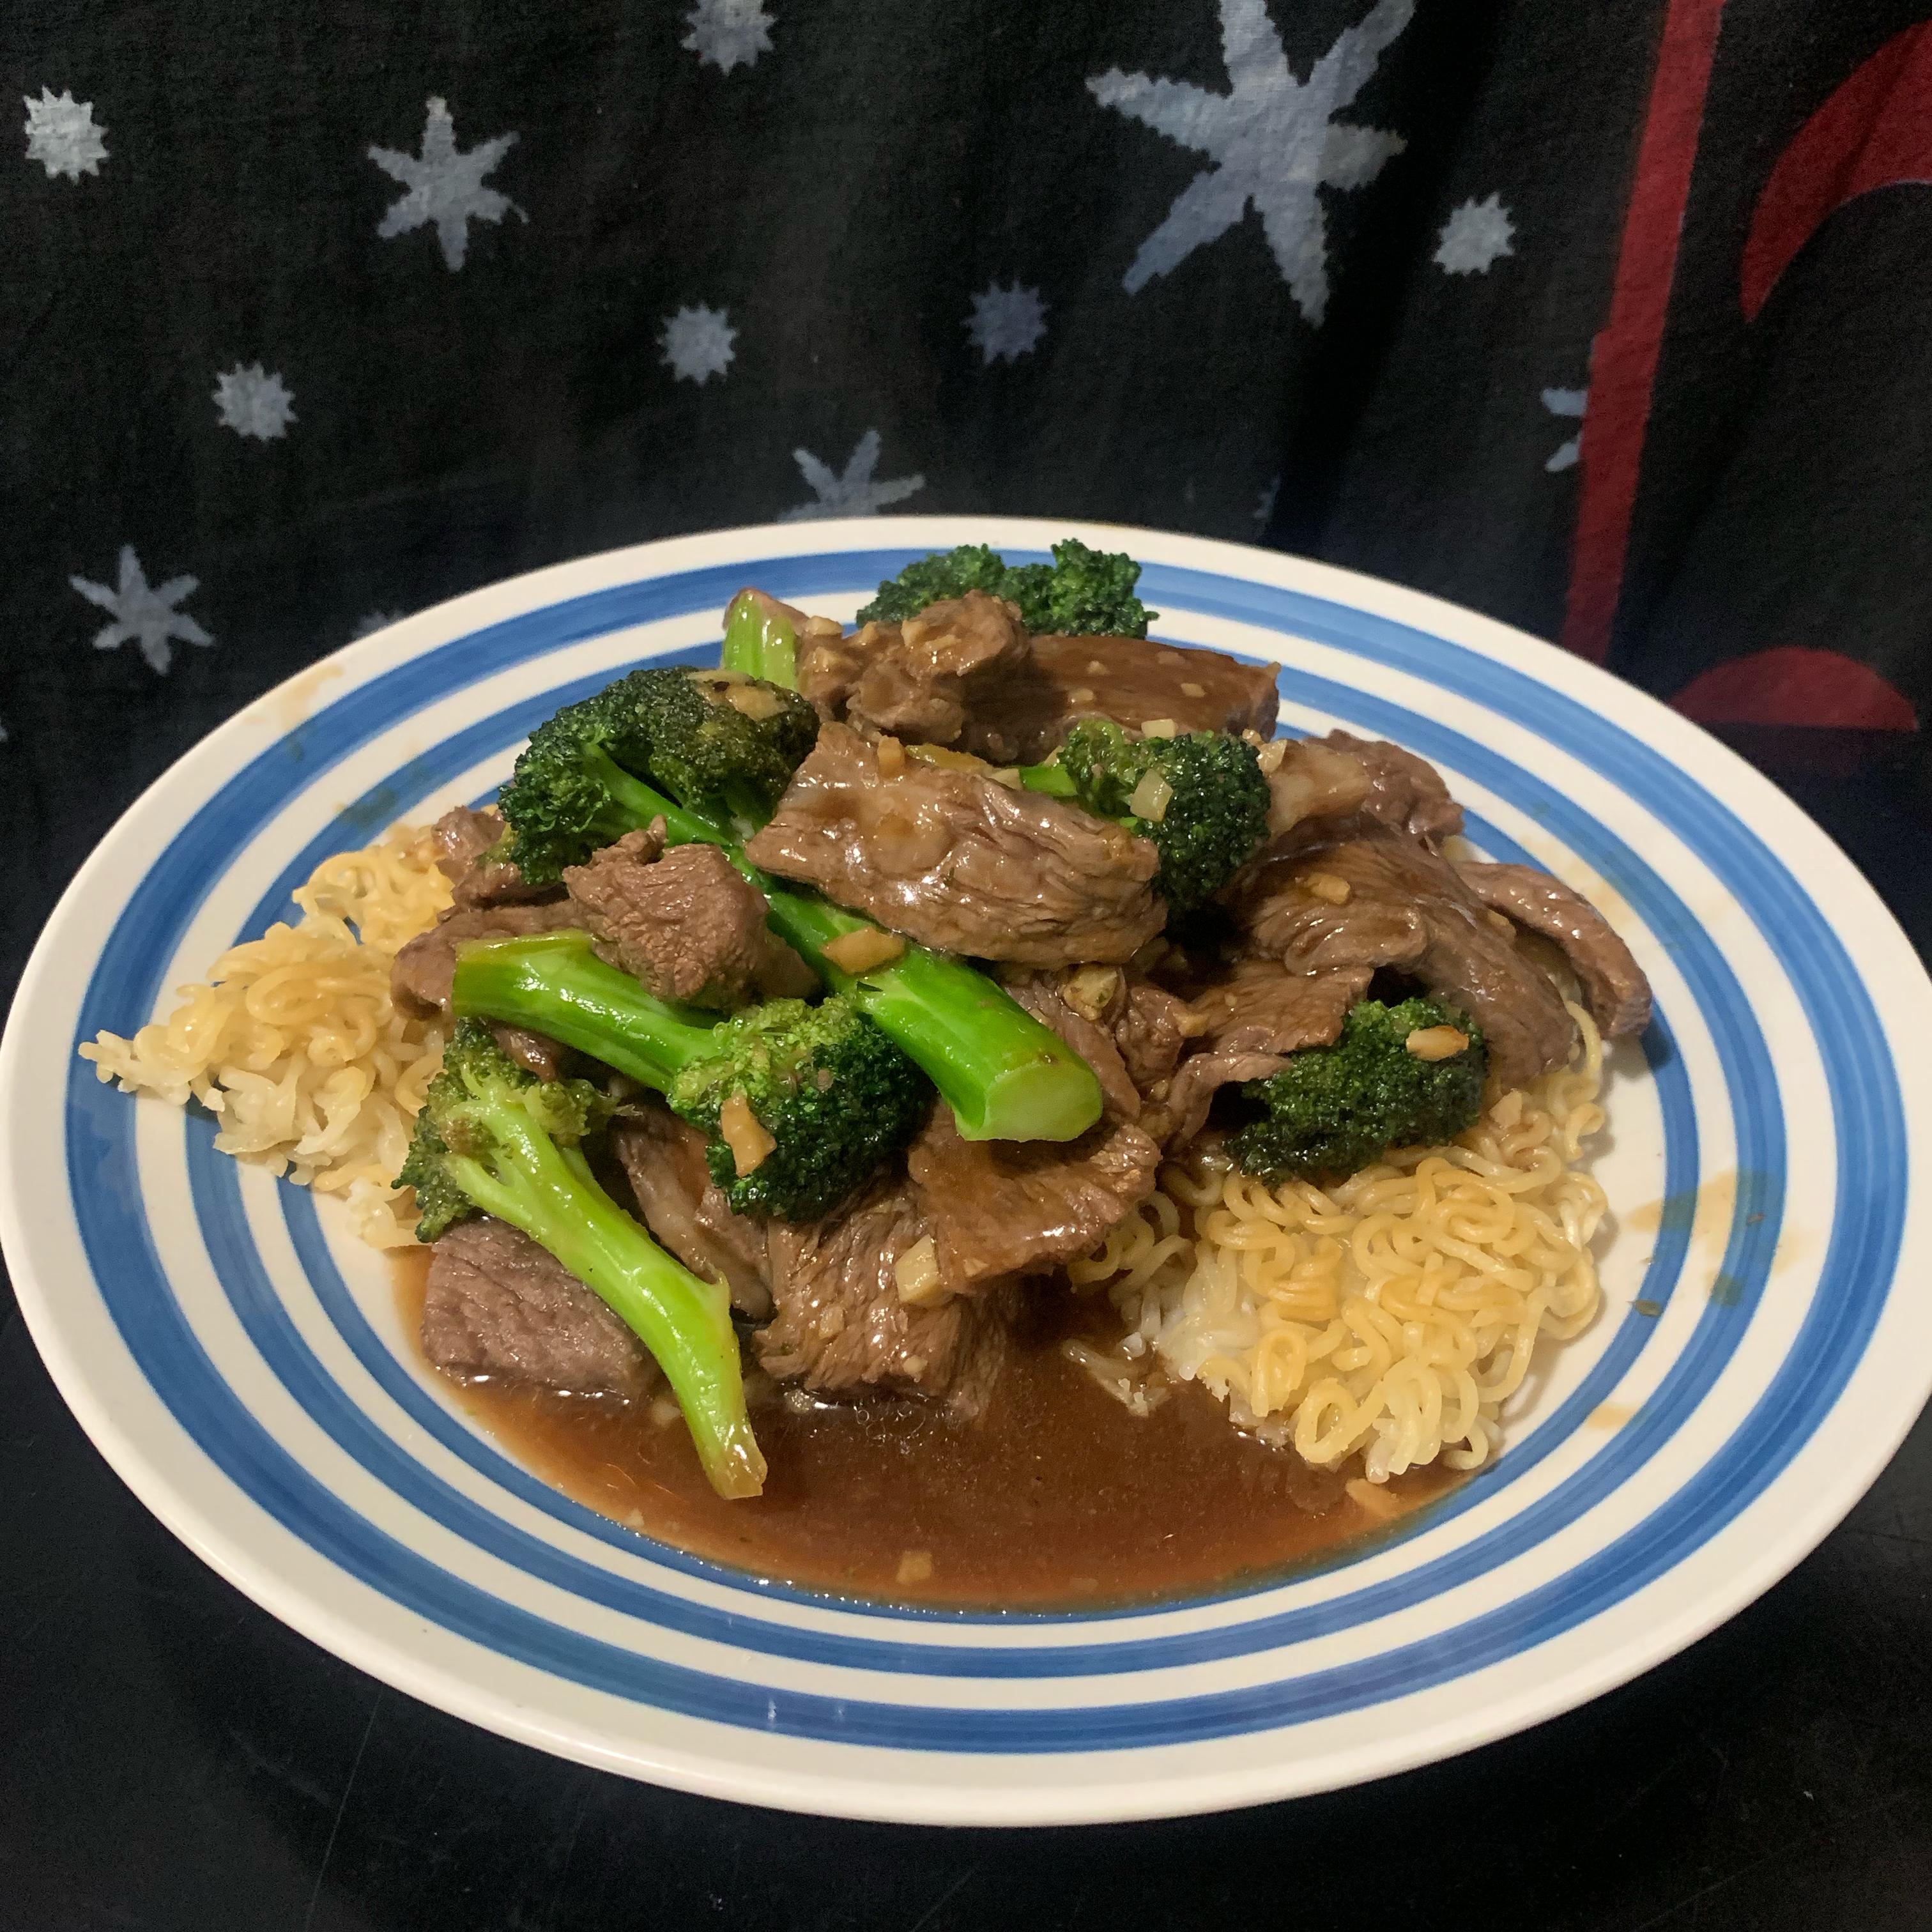 Stir-Fried Beef and Broccoli with Crisp Ramen Noodle Cake